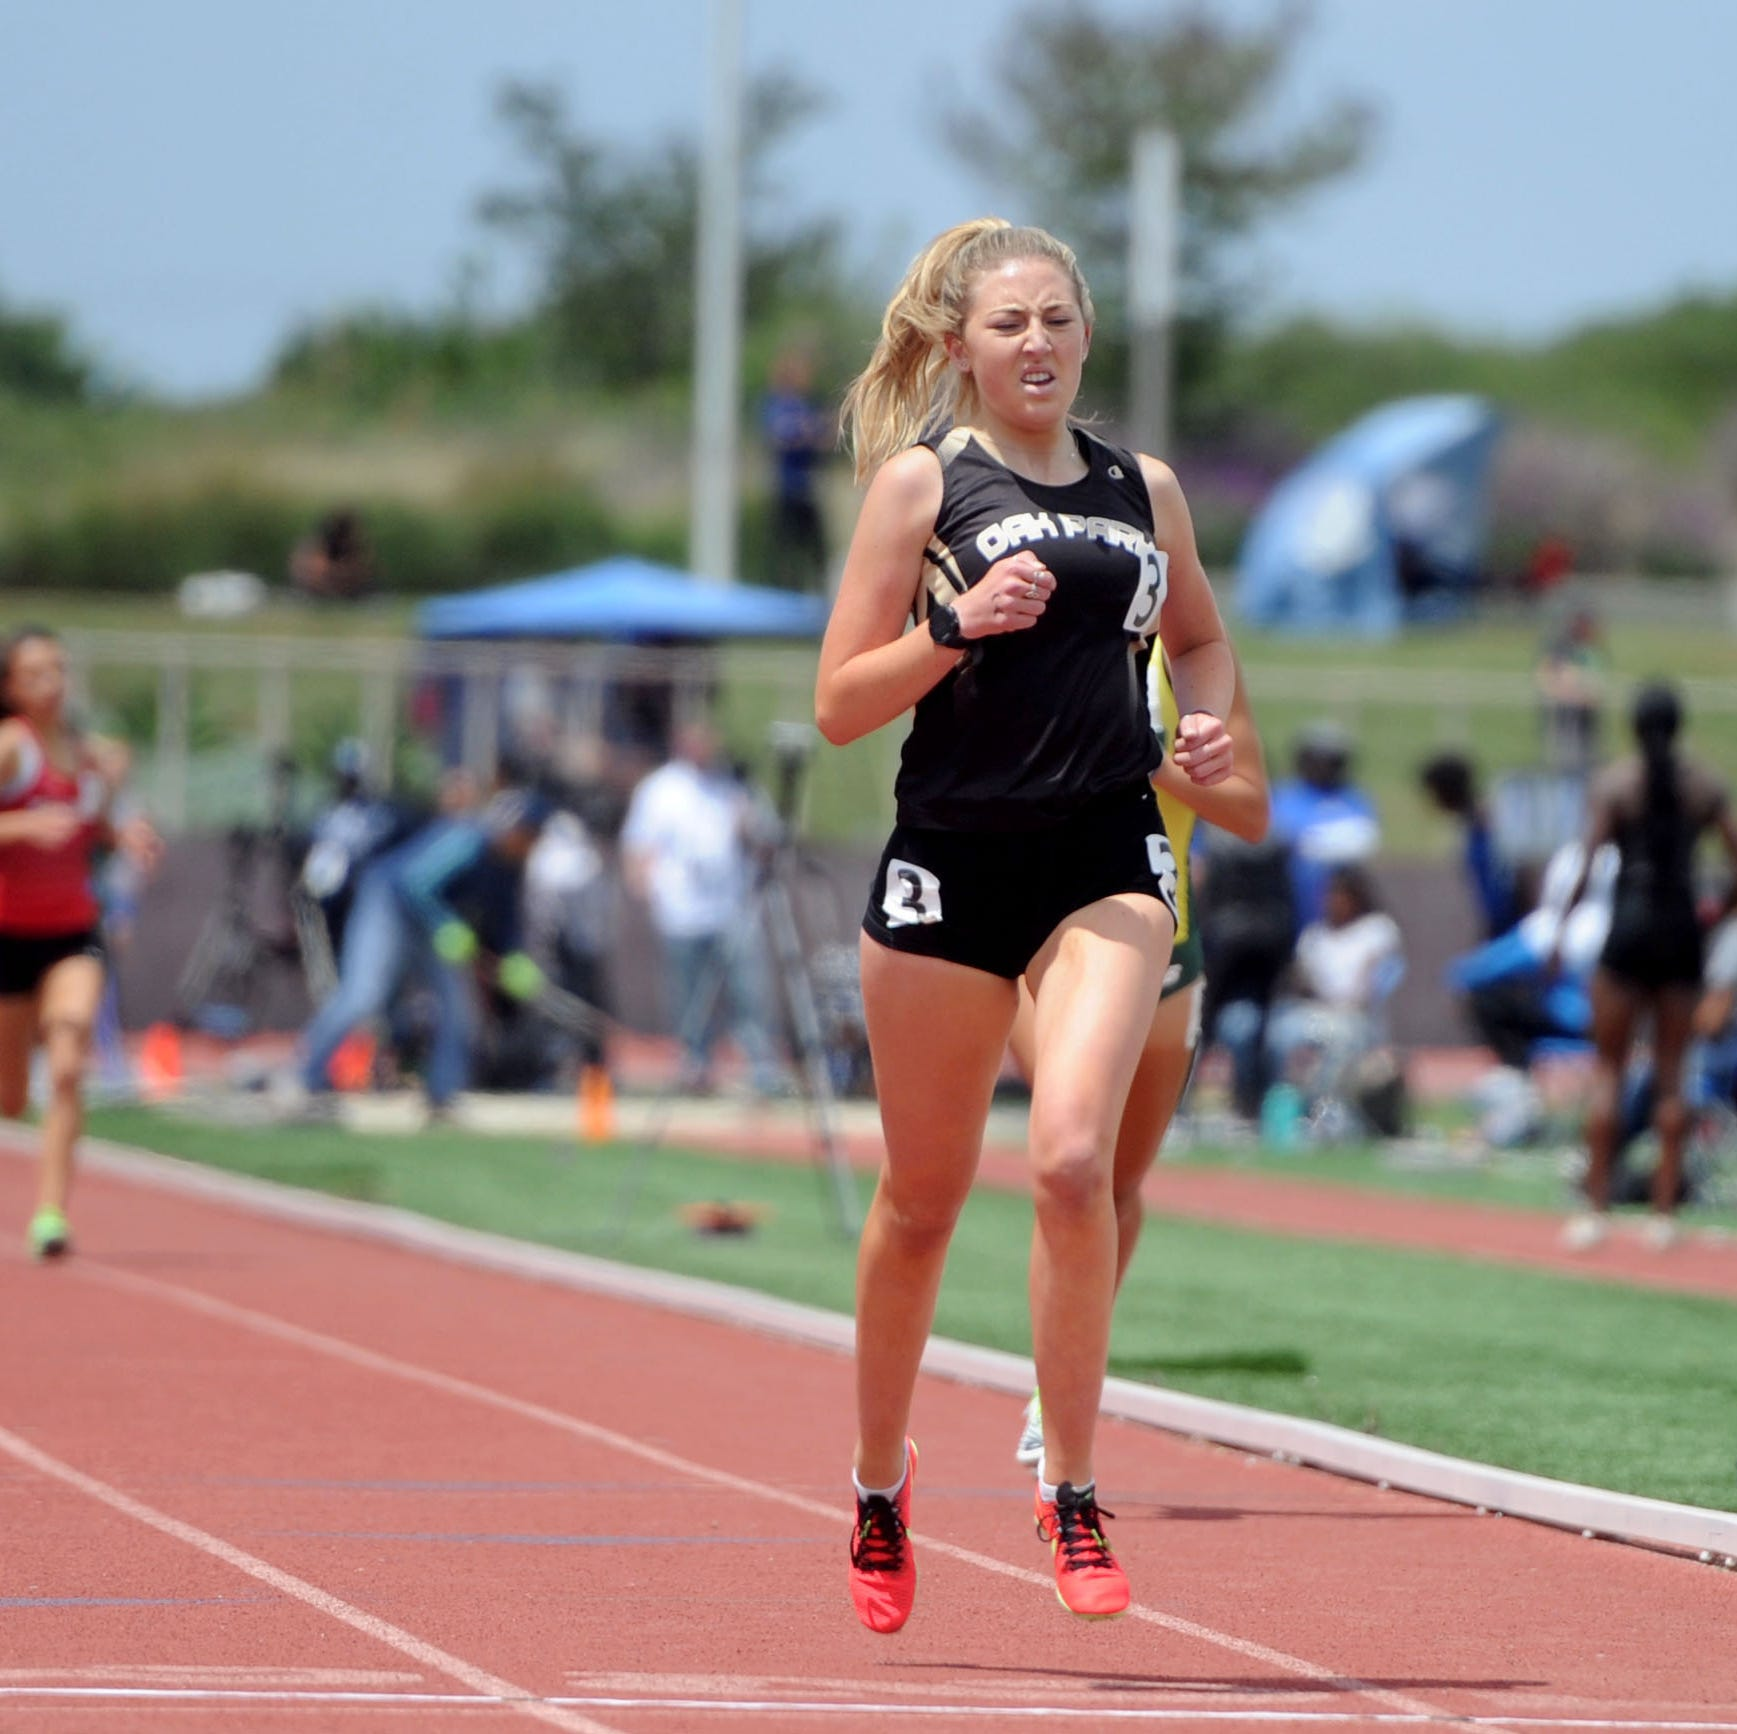 Oak Park's Sarah Shulze achieves grueling double-distance goal at CIF-SS track finals